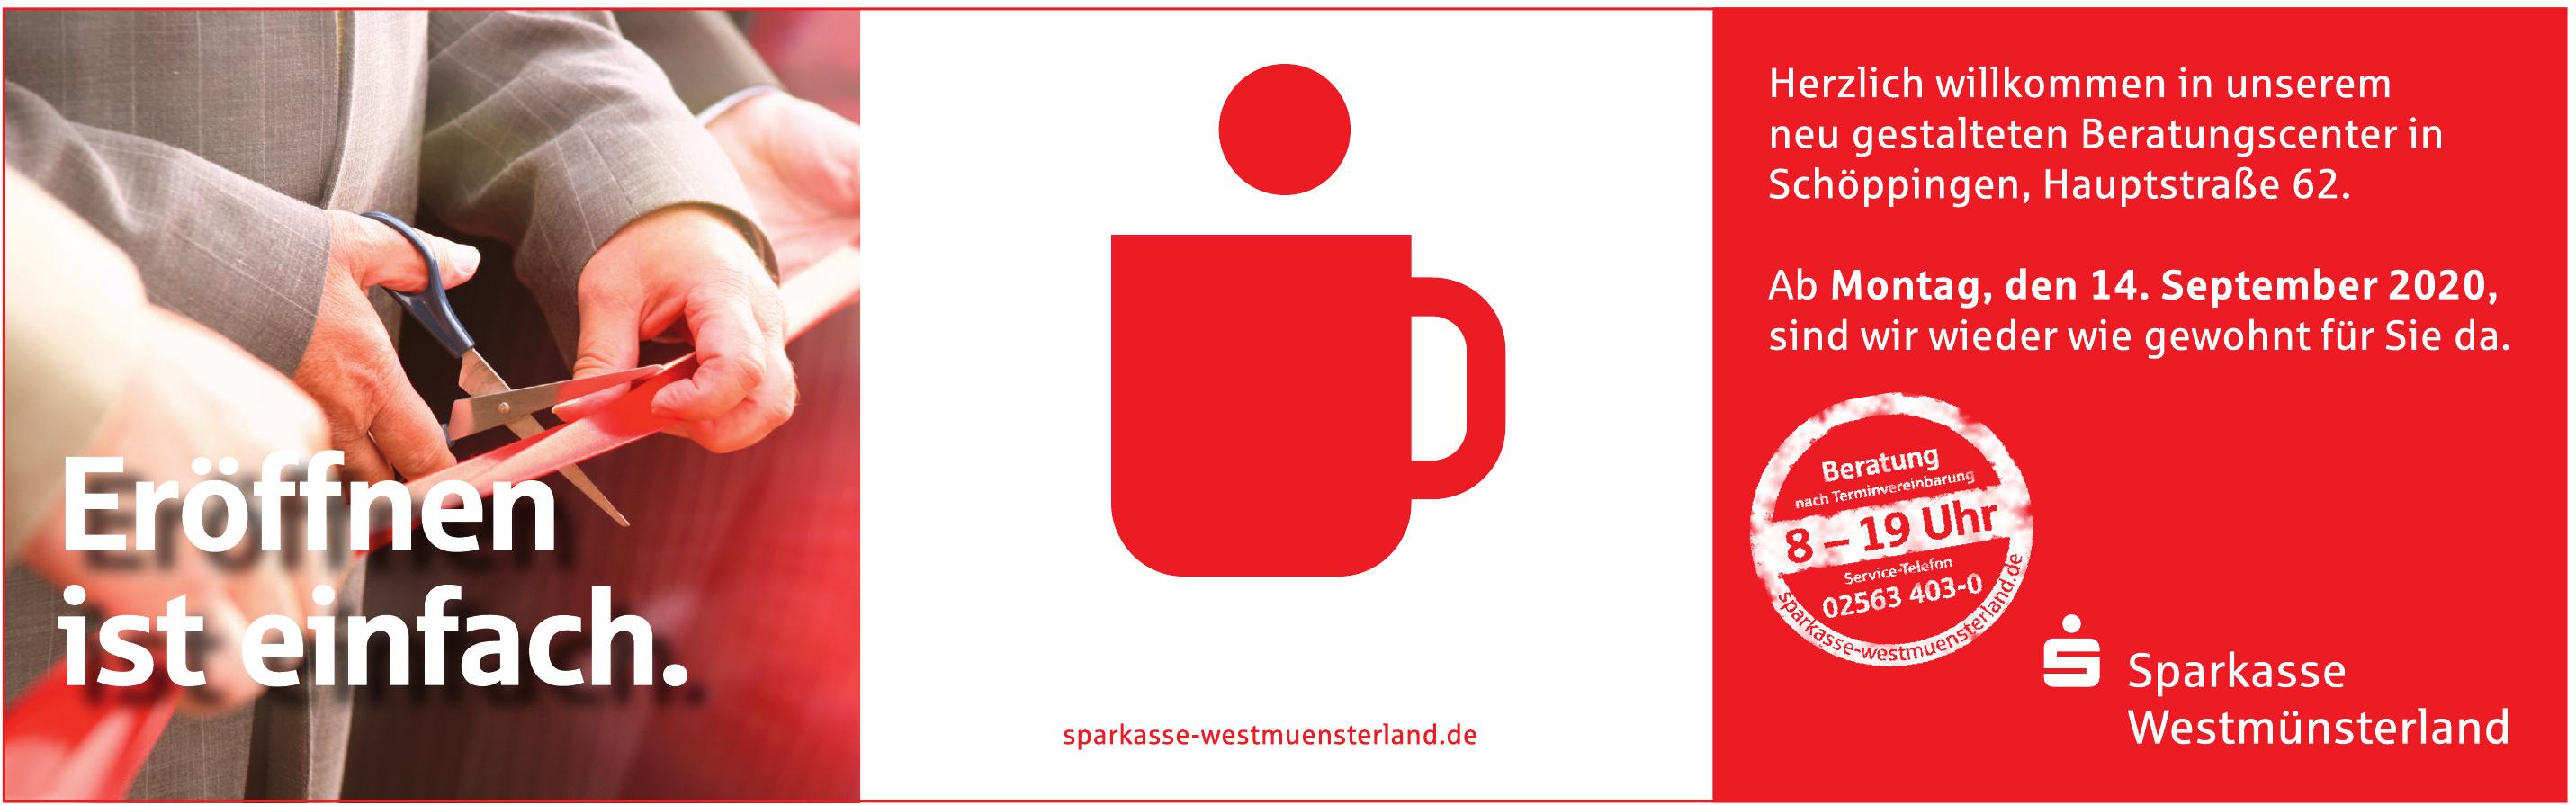 Sparkasse Westmünsterland